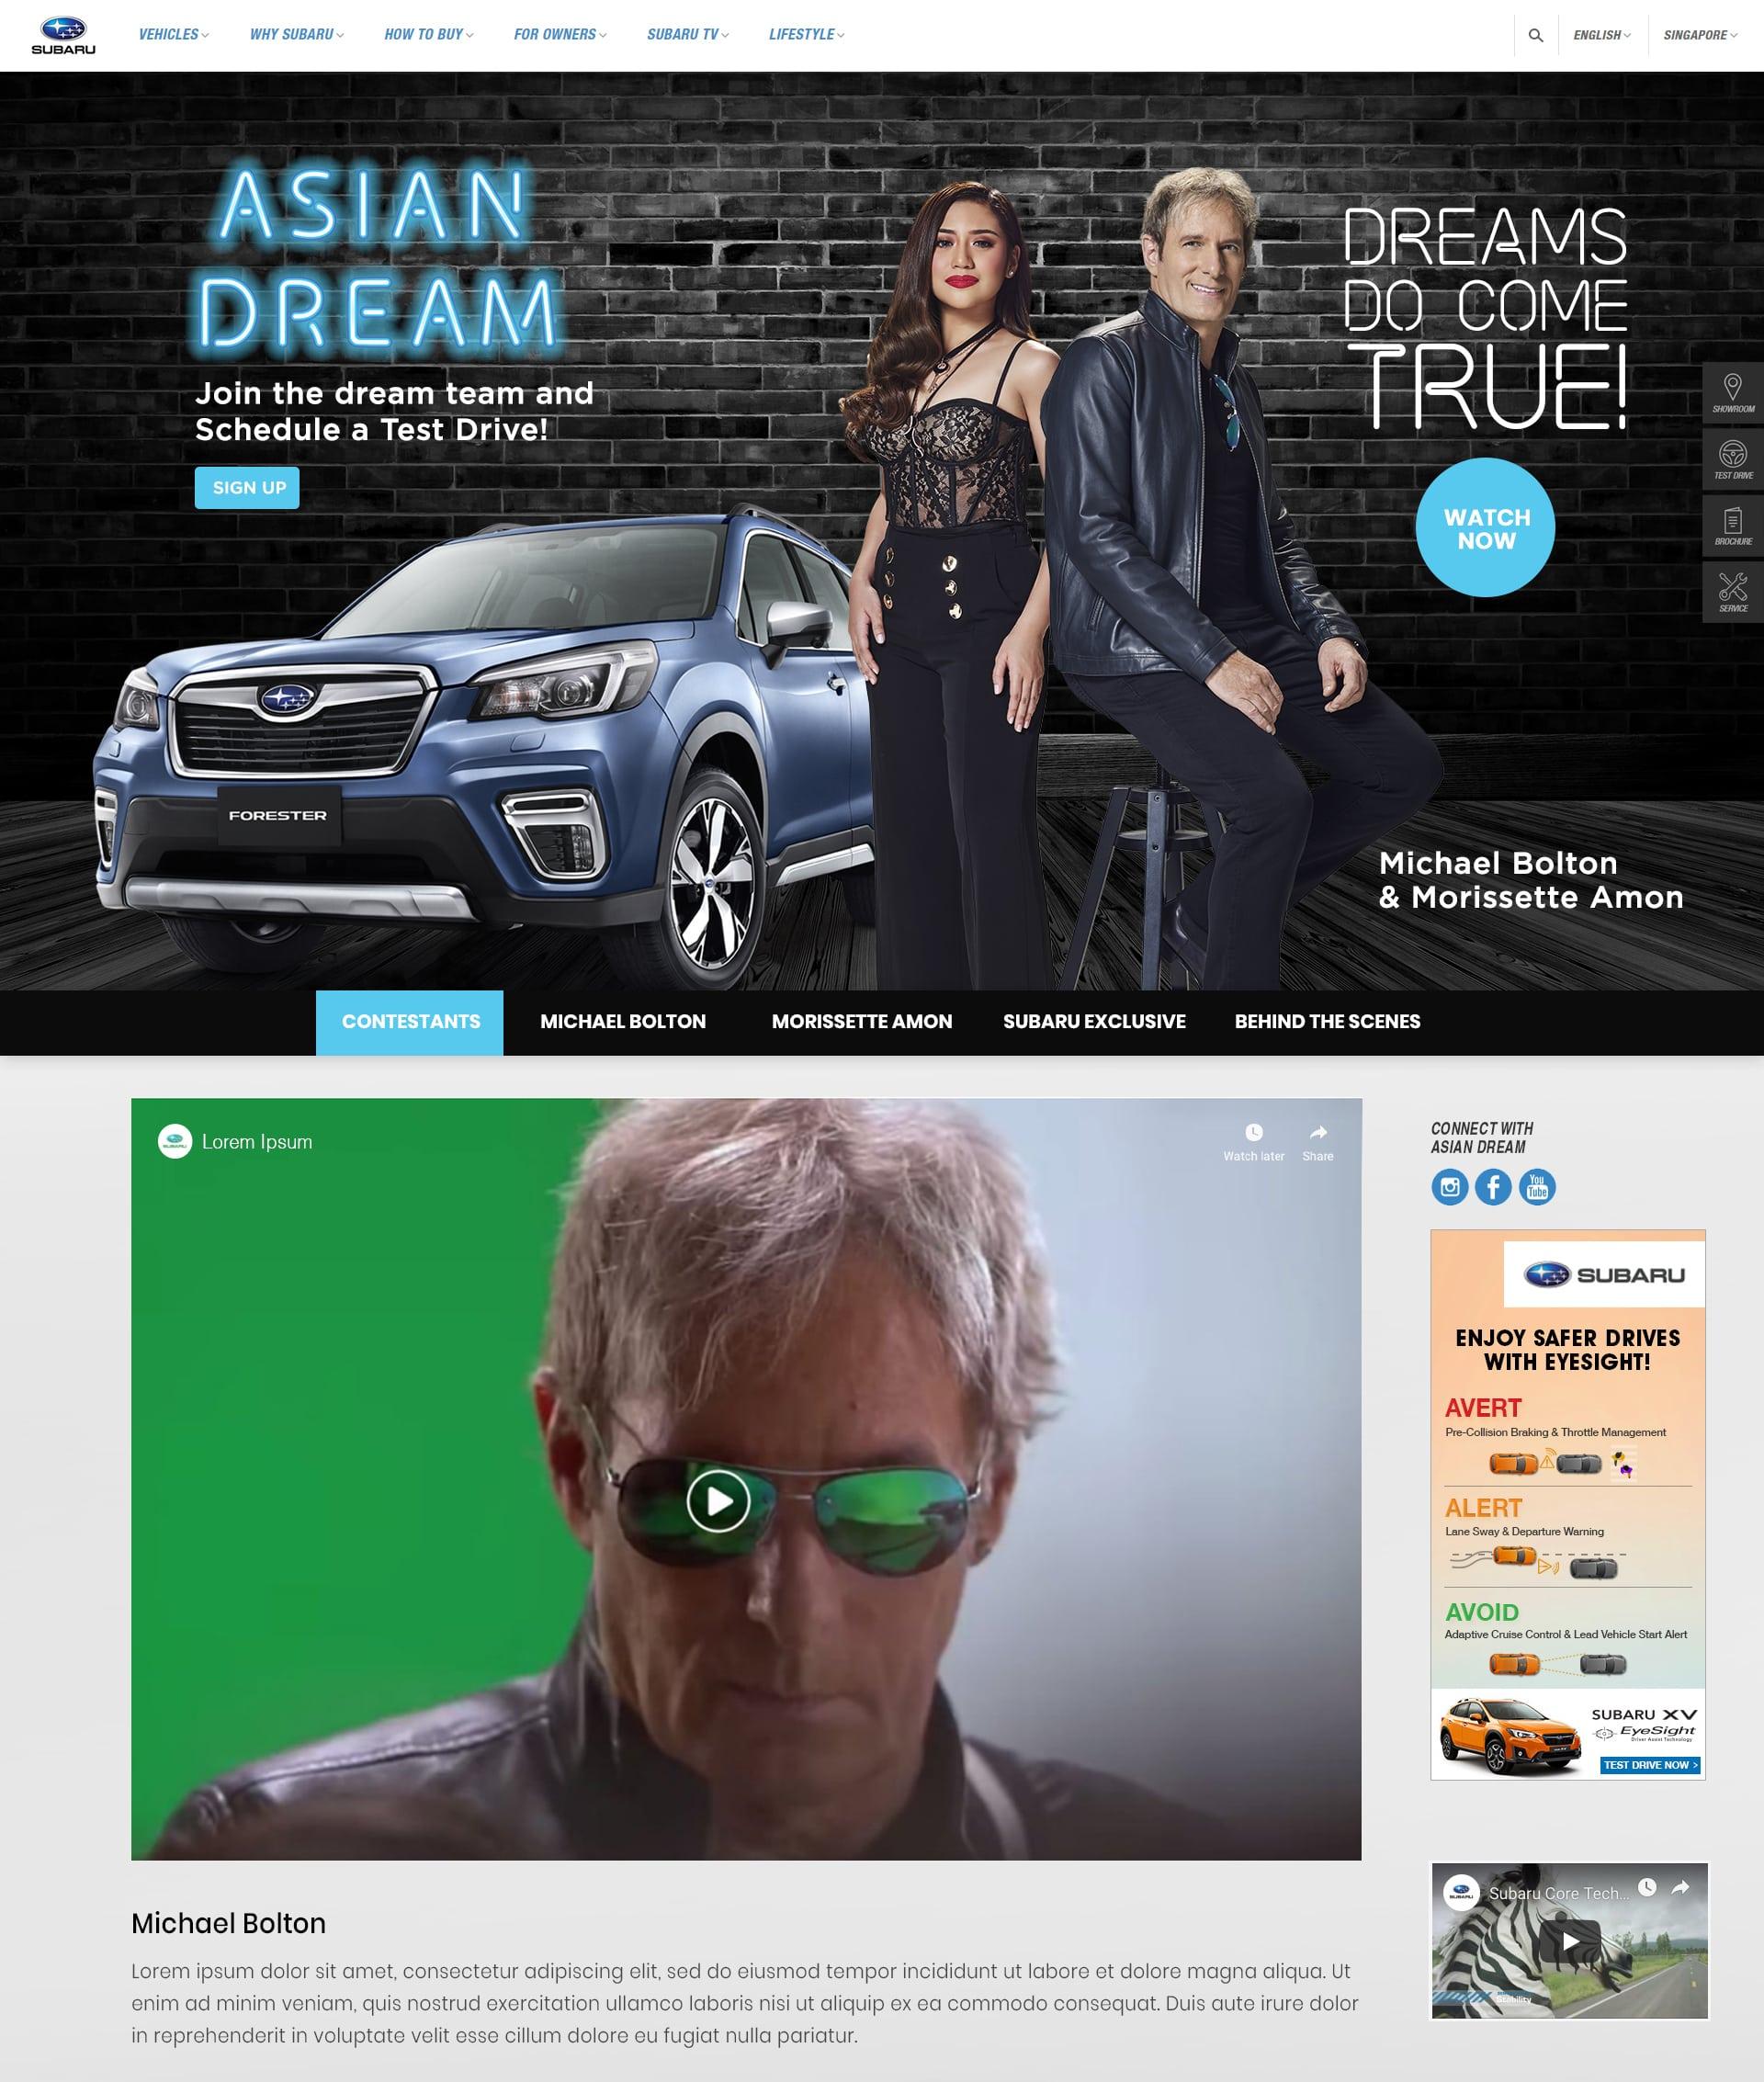 asian dream website mockup